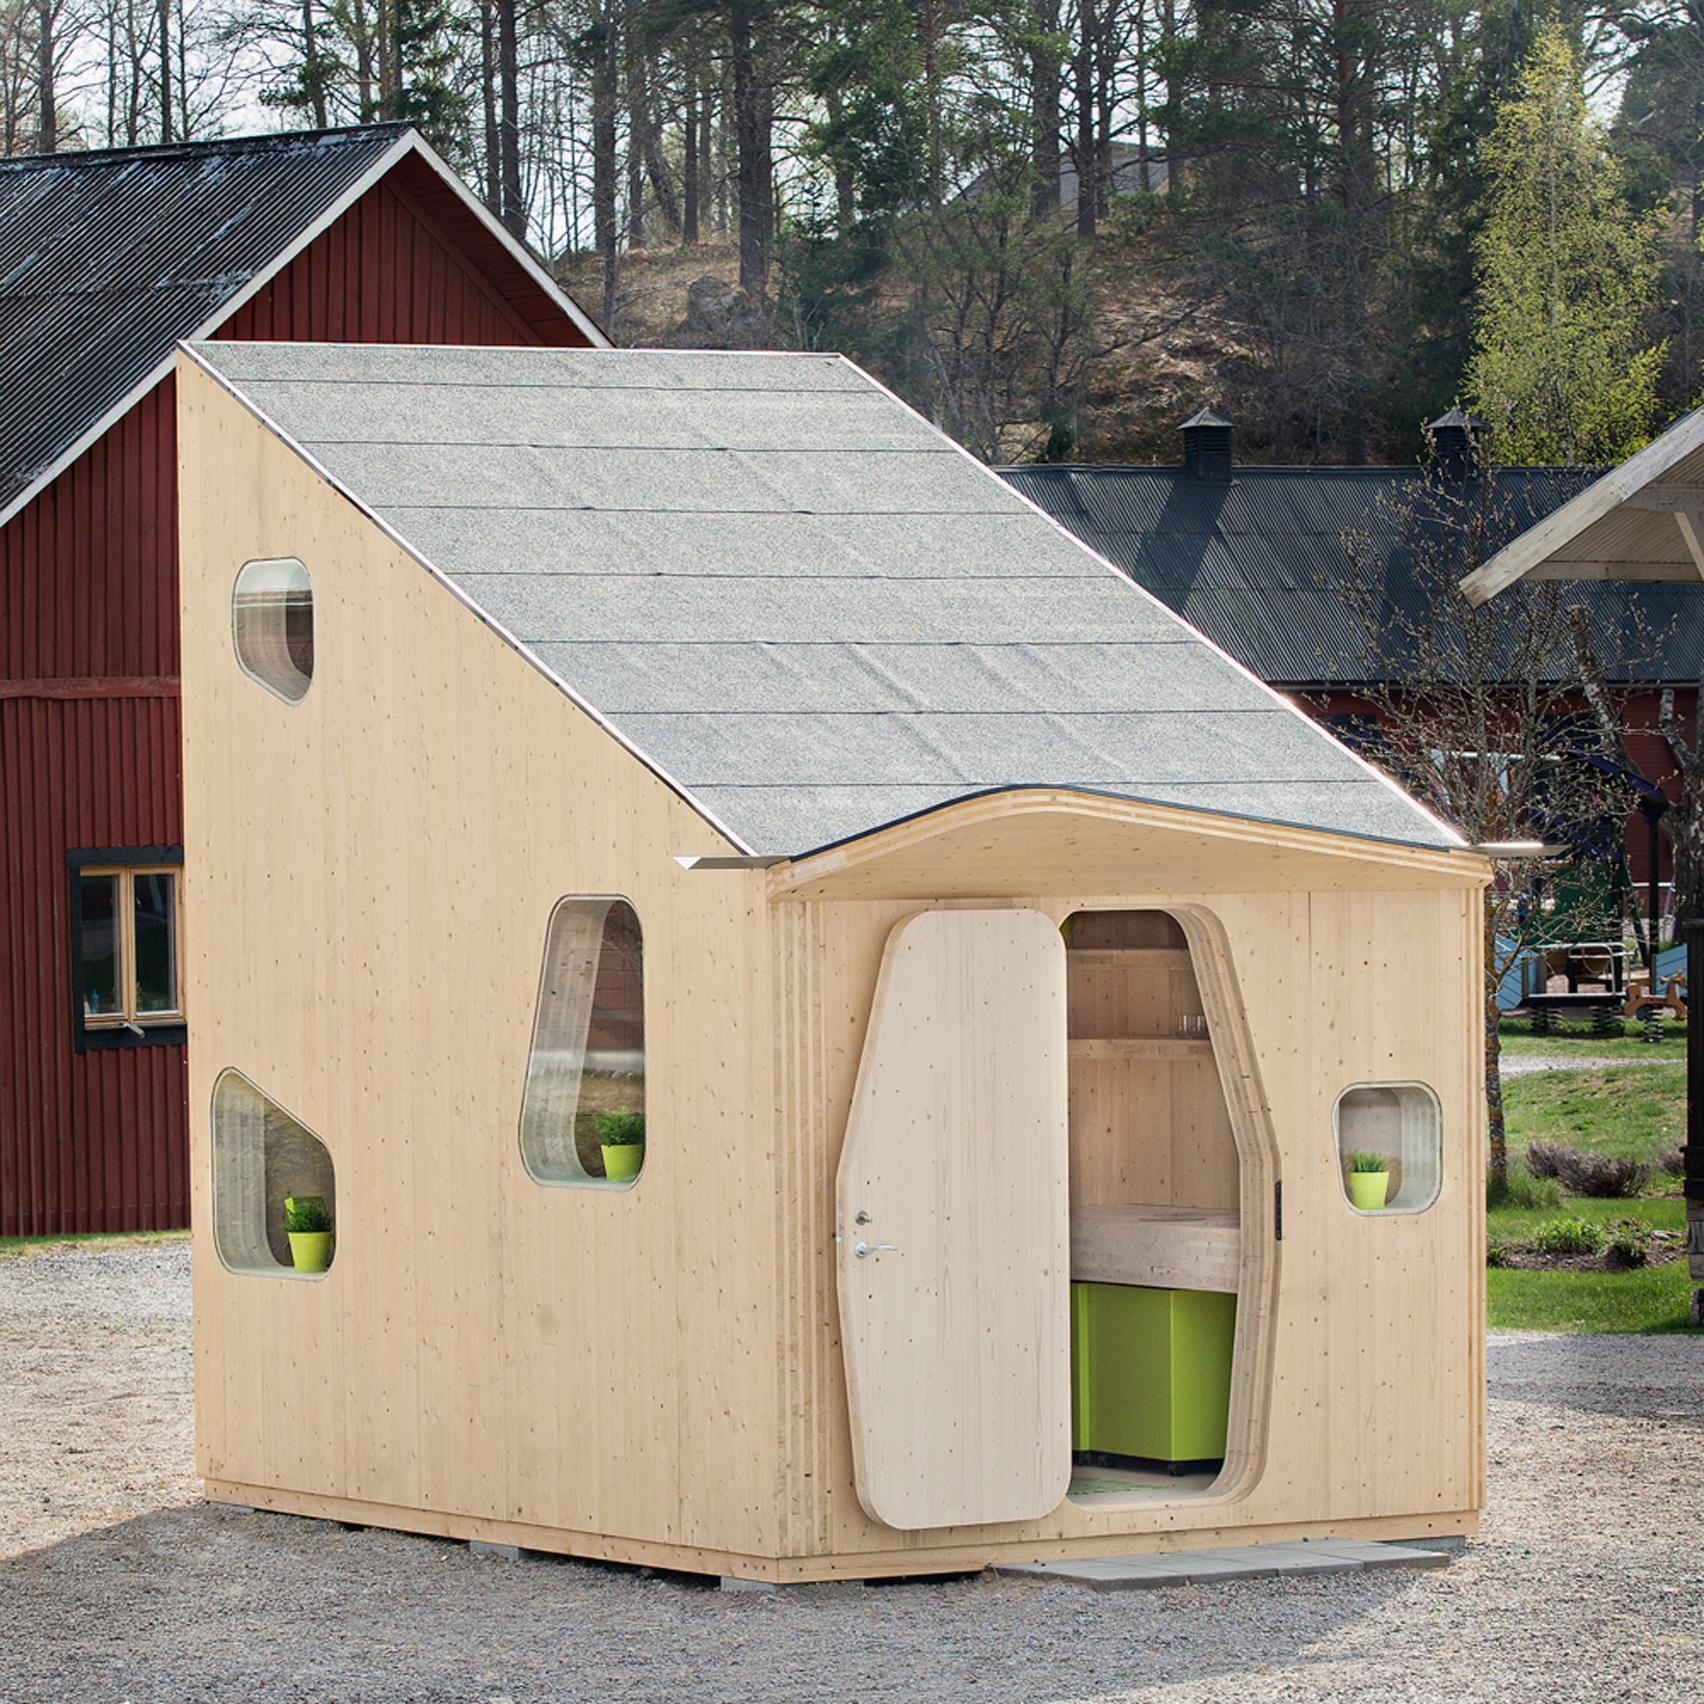 smart-student-unit-tengbom-micro-homes-roundups-architecture_dezeen_sq.jpg